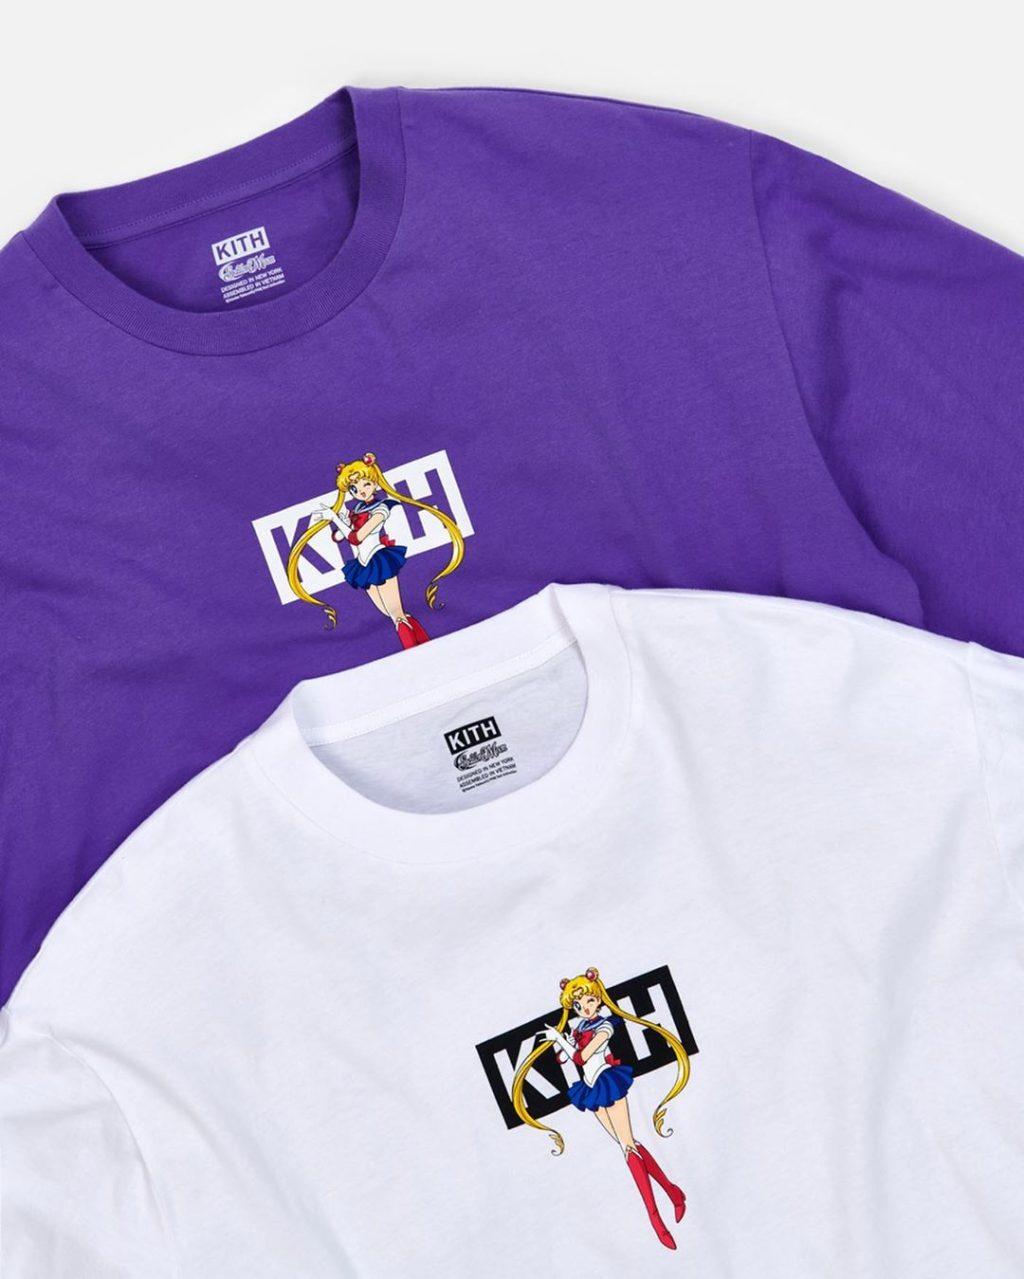 sailormoon-kith-women-20ss-collaboration-release-20200417